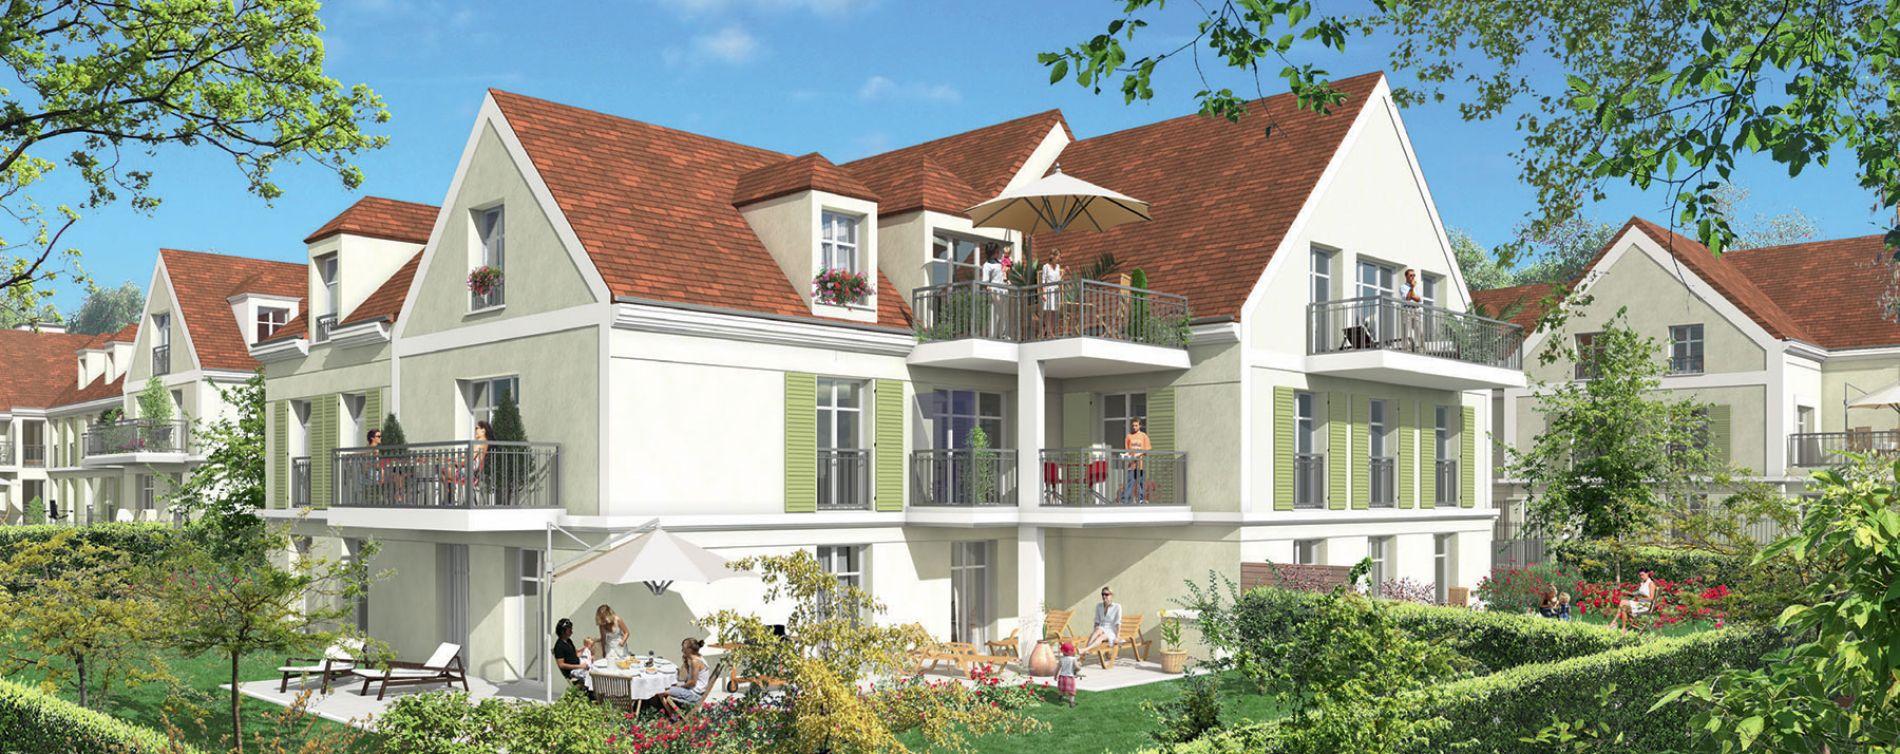 Résidence Villa Louise à Andilly